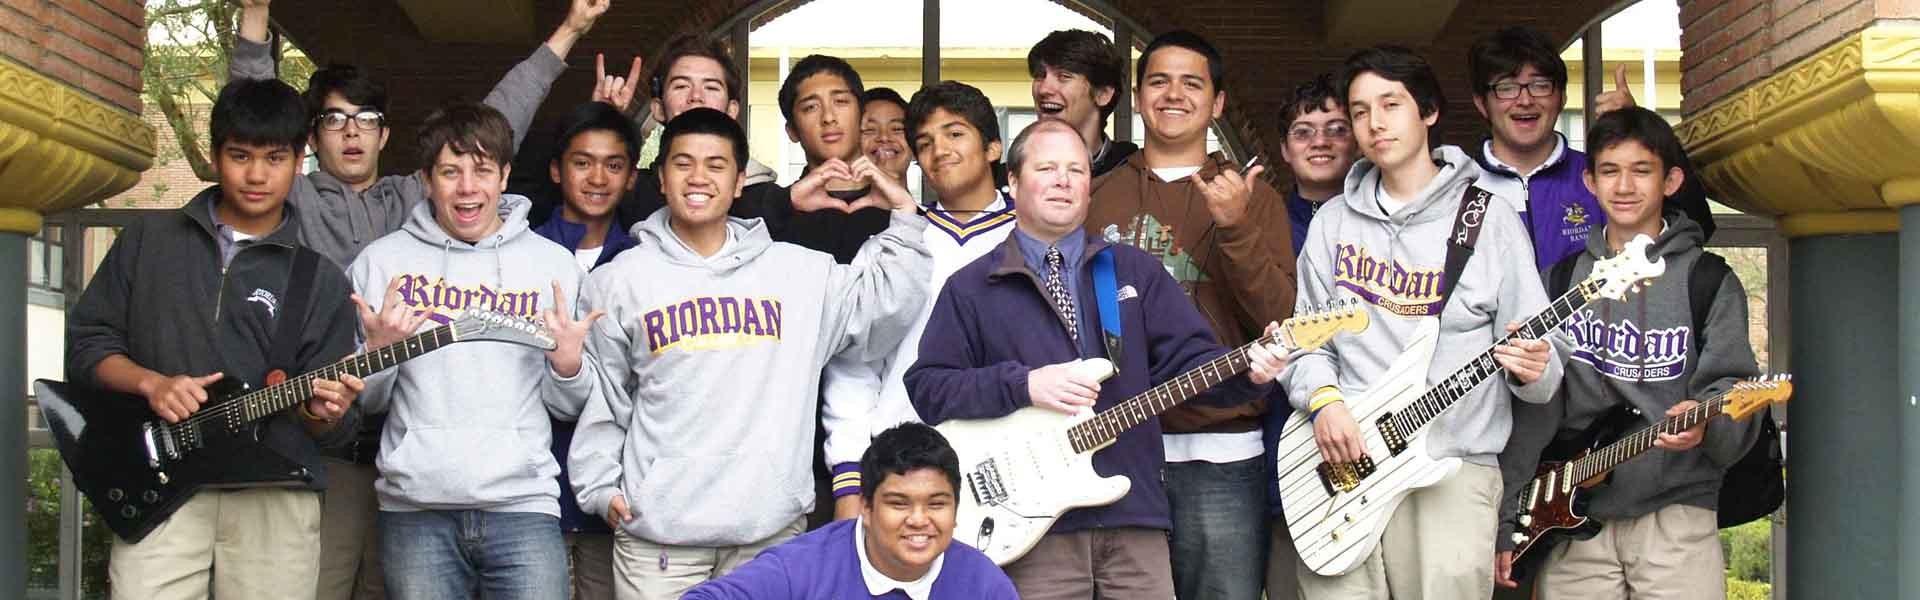 ArchbishopRiordanHighSchool-highschool-California-Groupboys-Main-BAnner-2019